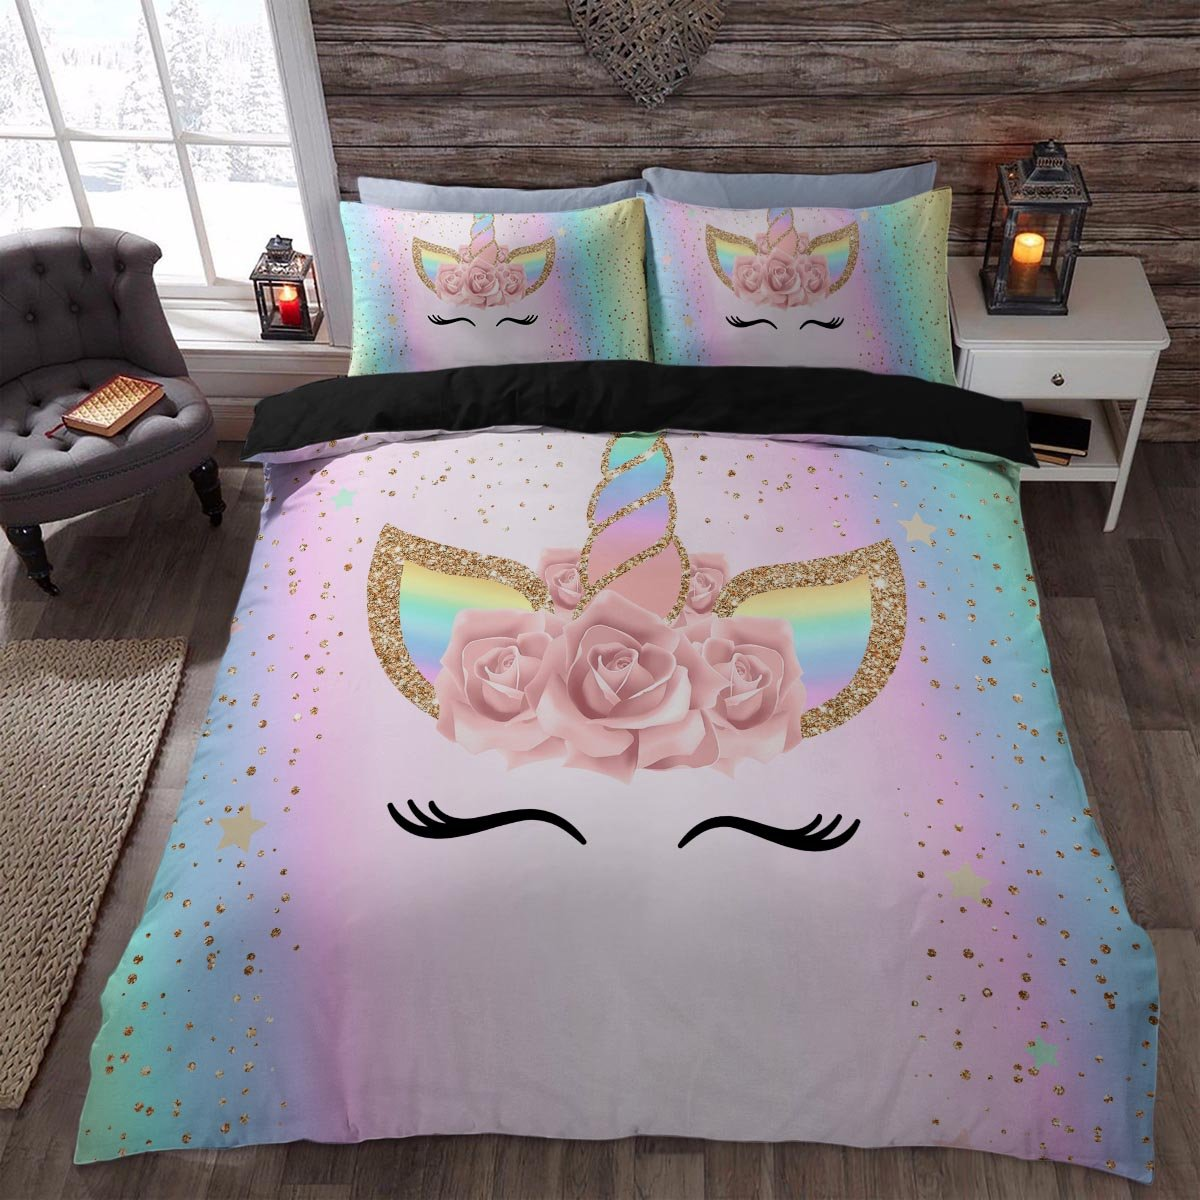 Unicorn Rainbow Colors 3d Bedding Sets Printed Duvet Cover